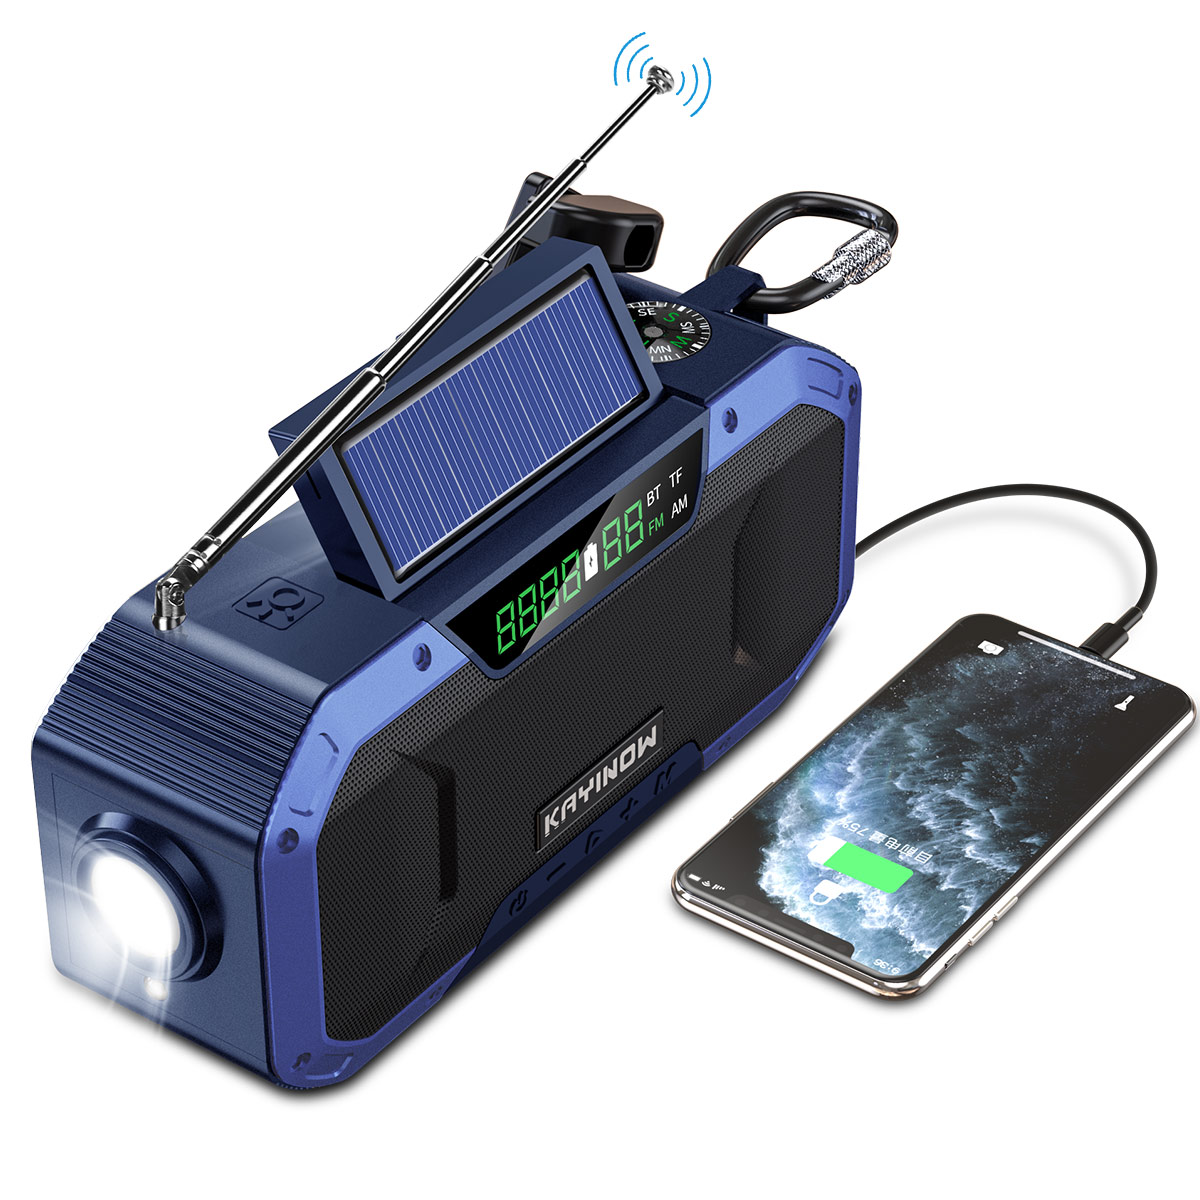 Solar & Hand Crank Bluetooth Speaker Radio with LED Flashlight Flash Lights & Head Lamps Lighting Gadgets